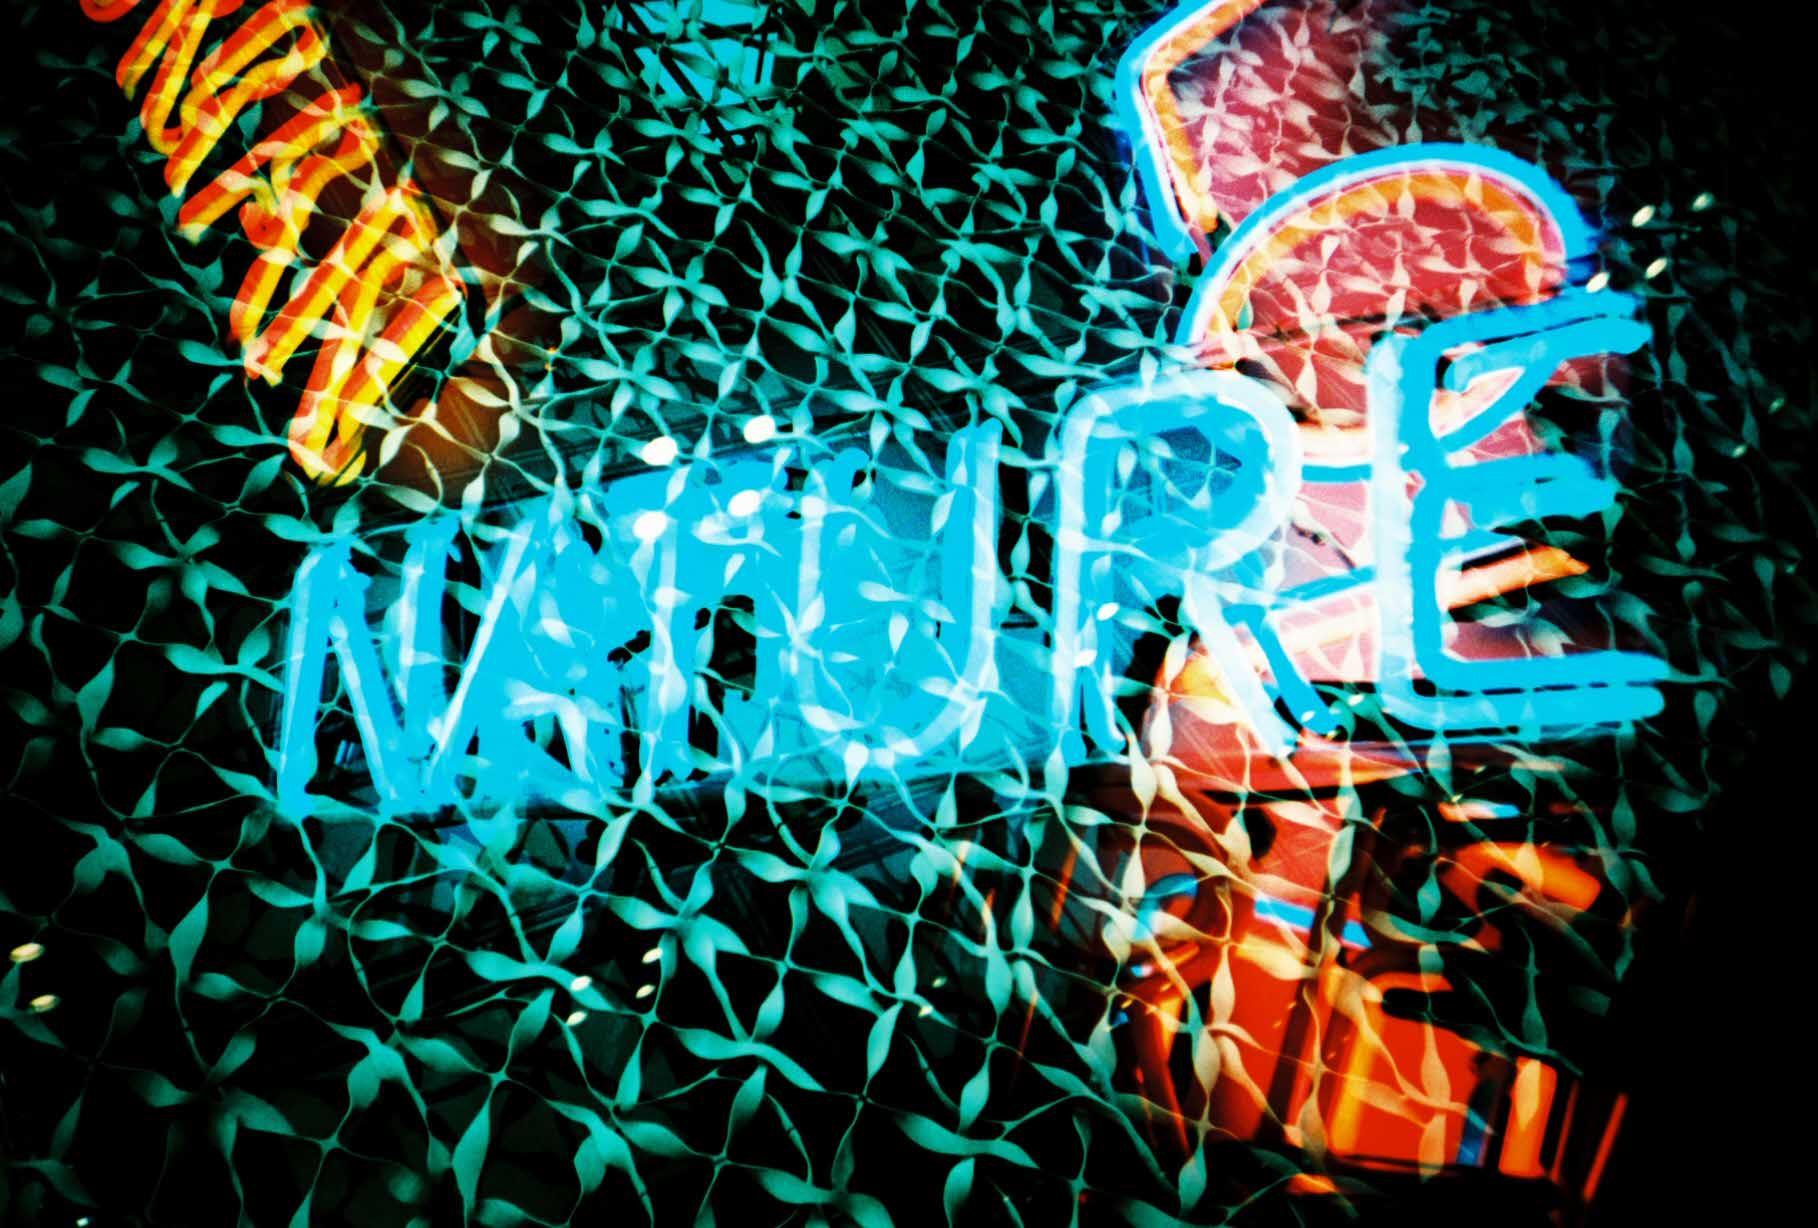 FilmSwap-fotografia-oldskull-06